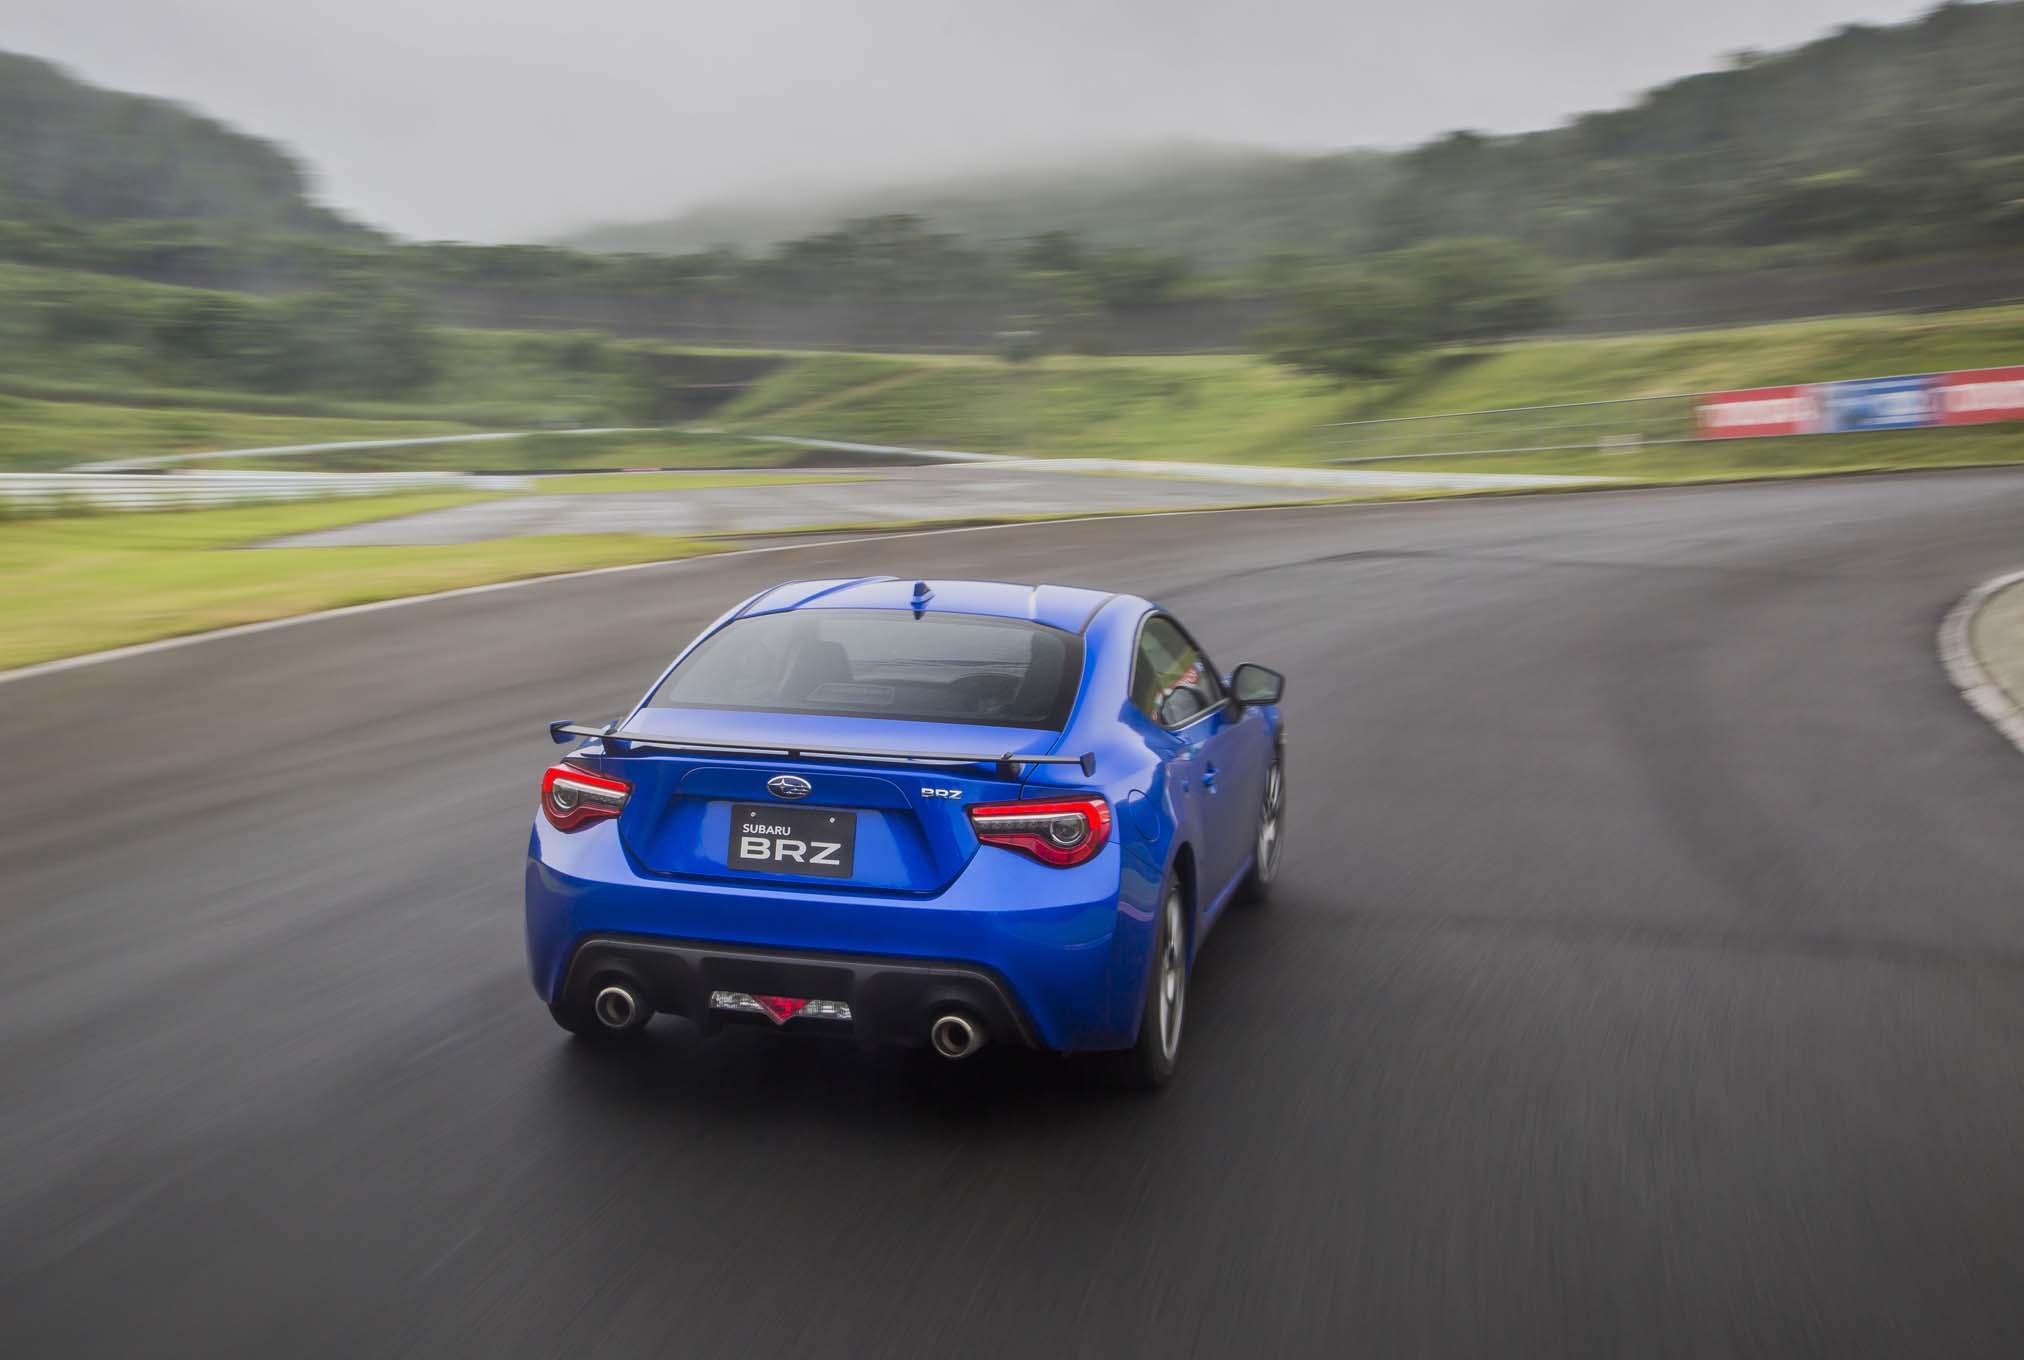 First Drive: 2017 Subaru BRZ | Automobile Magazine